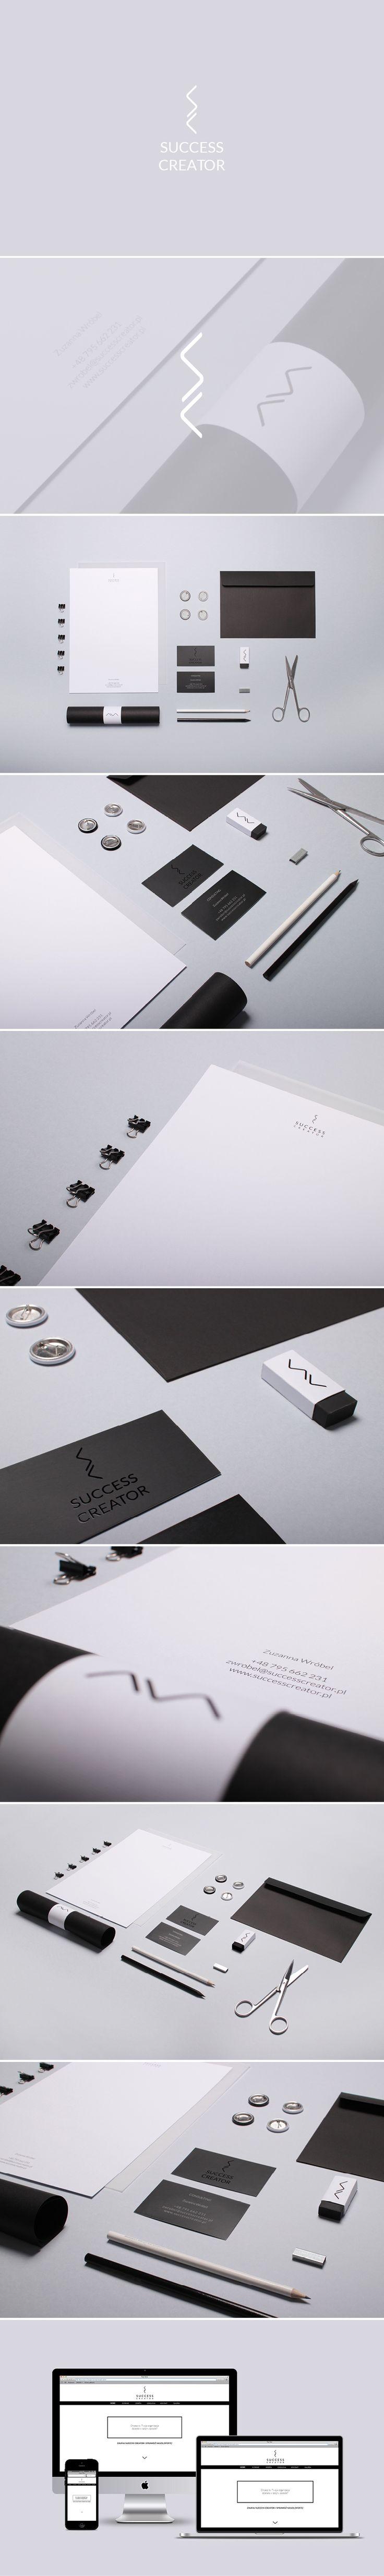 Identity SUCCESS CREATOR  Project: Marmolada design www.marmoladadesign.com www.successcreator.pl